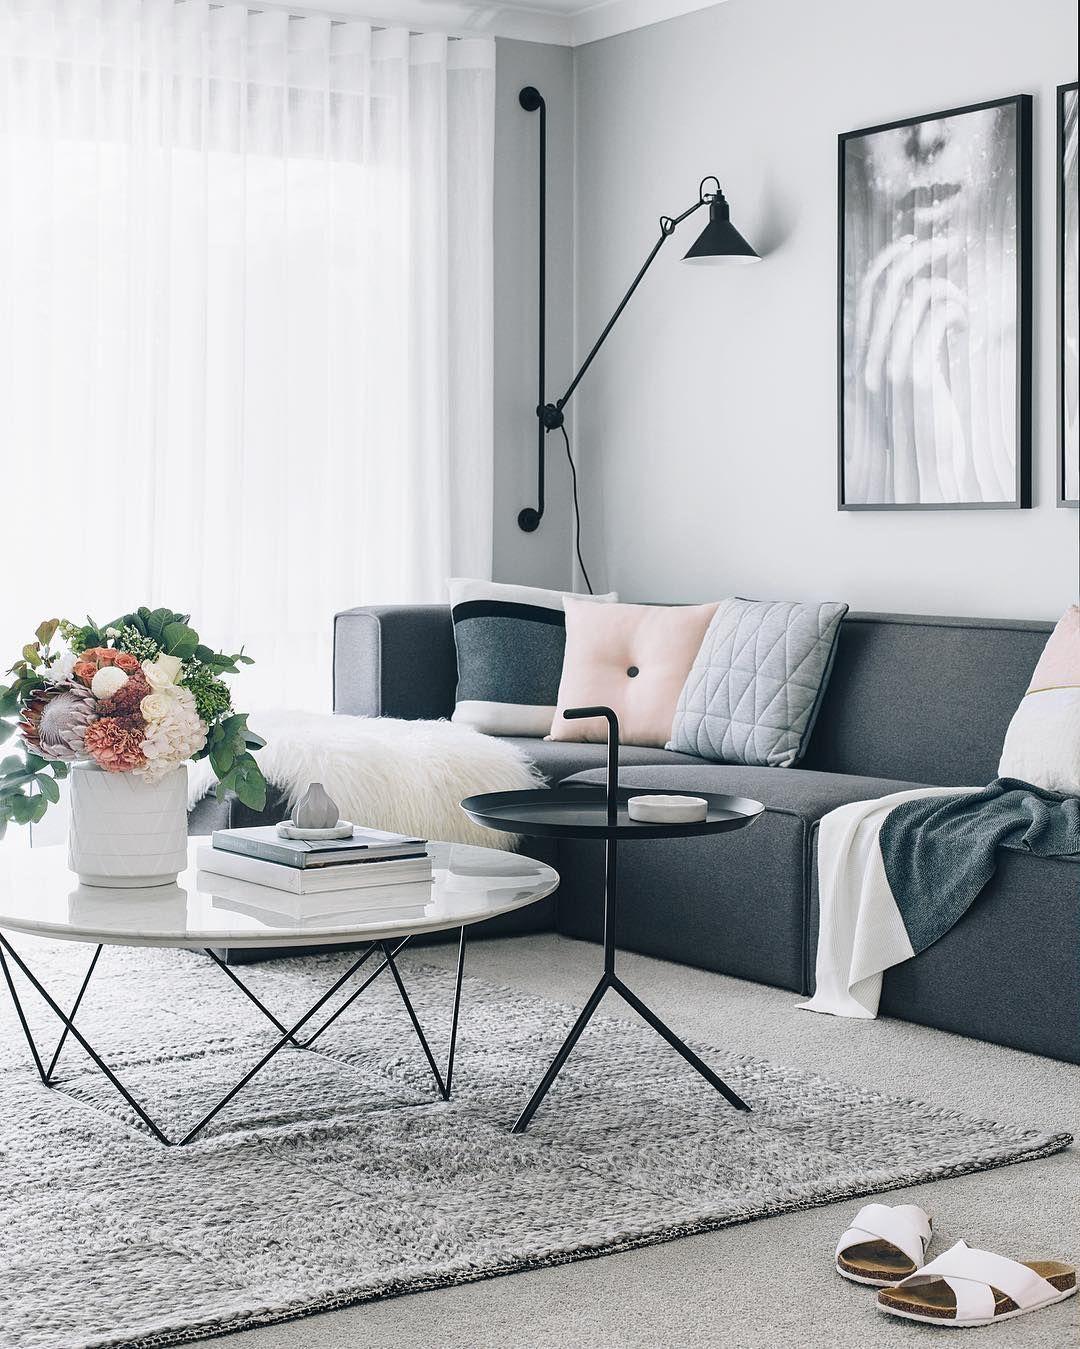 Mitte Jahrhundert Moderne Esszimmer Design Covet House Provides You  Excellent Living Room Ideas To Inspire You